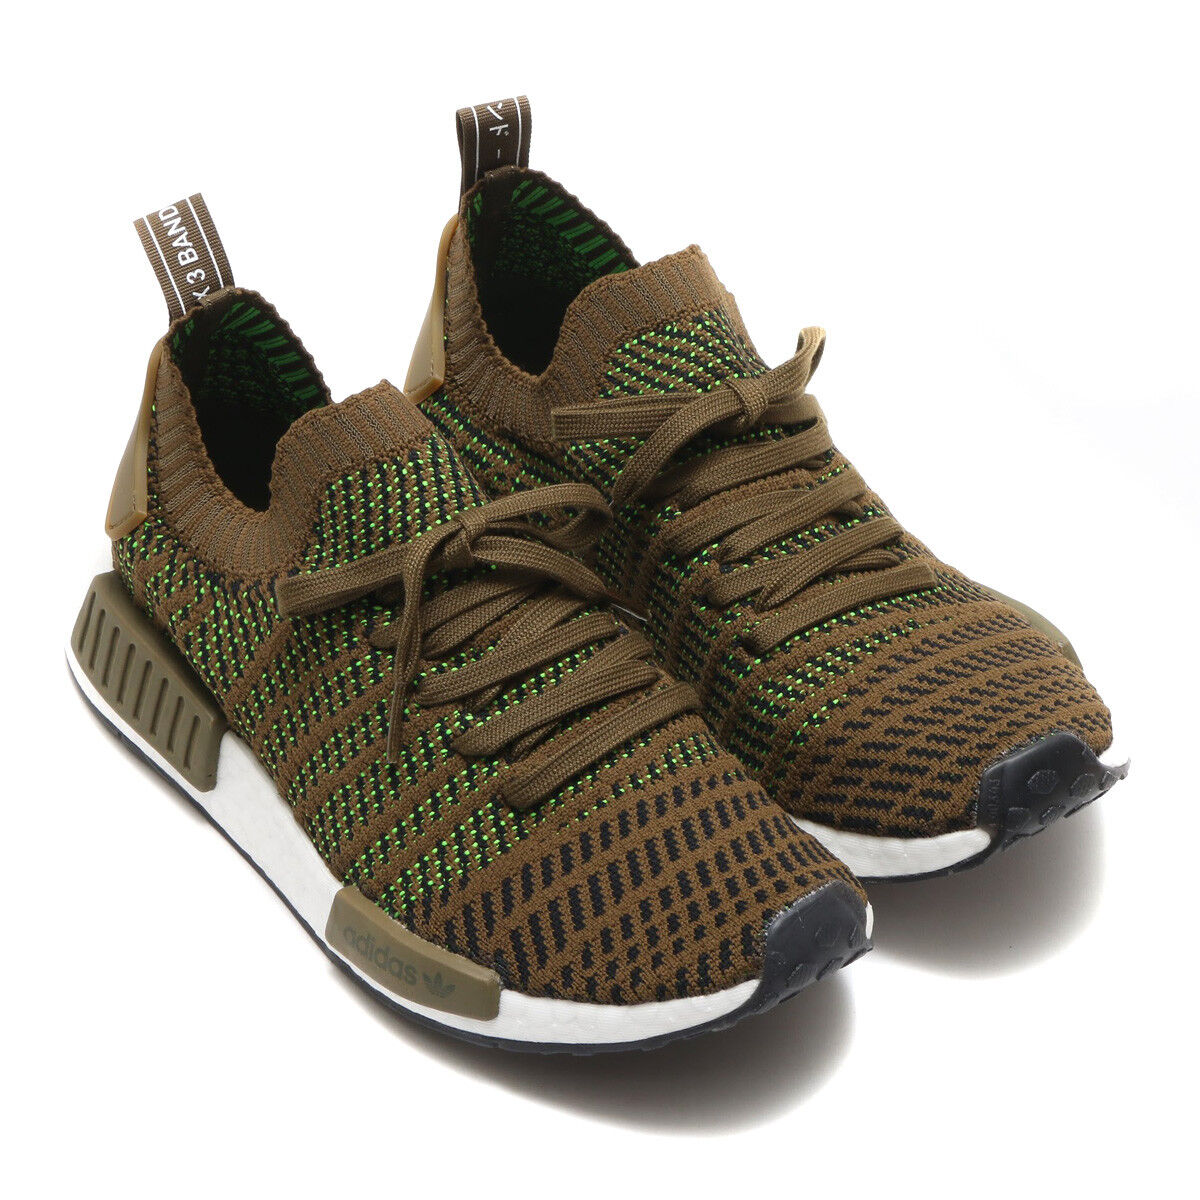 Adidas NMD_R1 STLT Primeknit Herrenschuhe Turnschuhe Schuhe CQ2389 Olive Laufschuhe